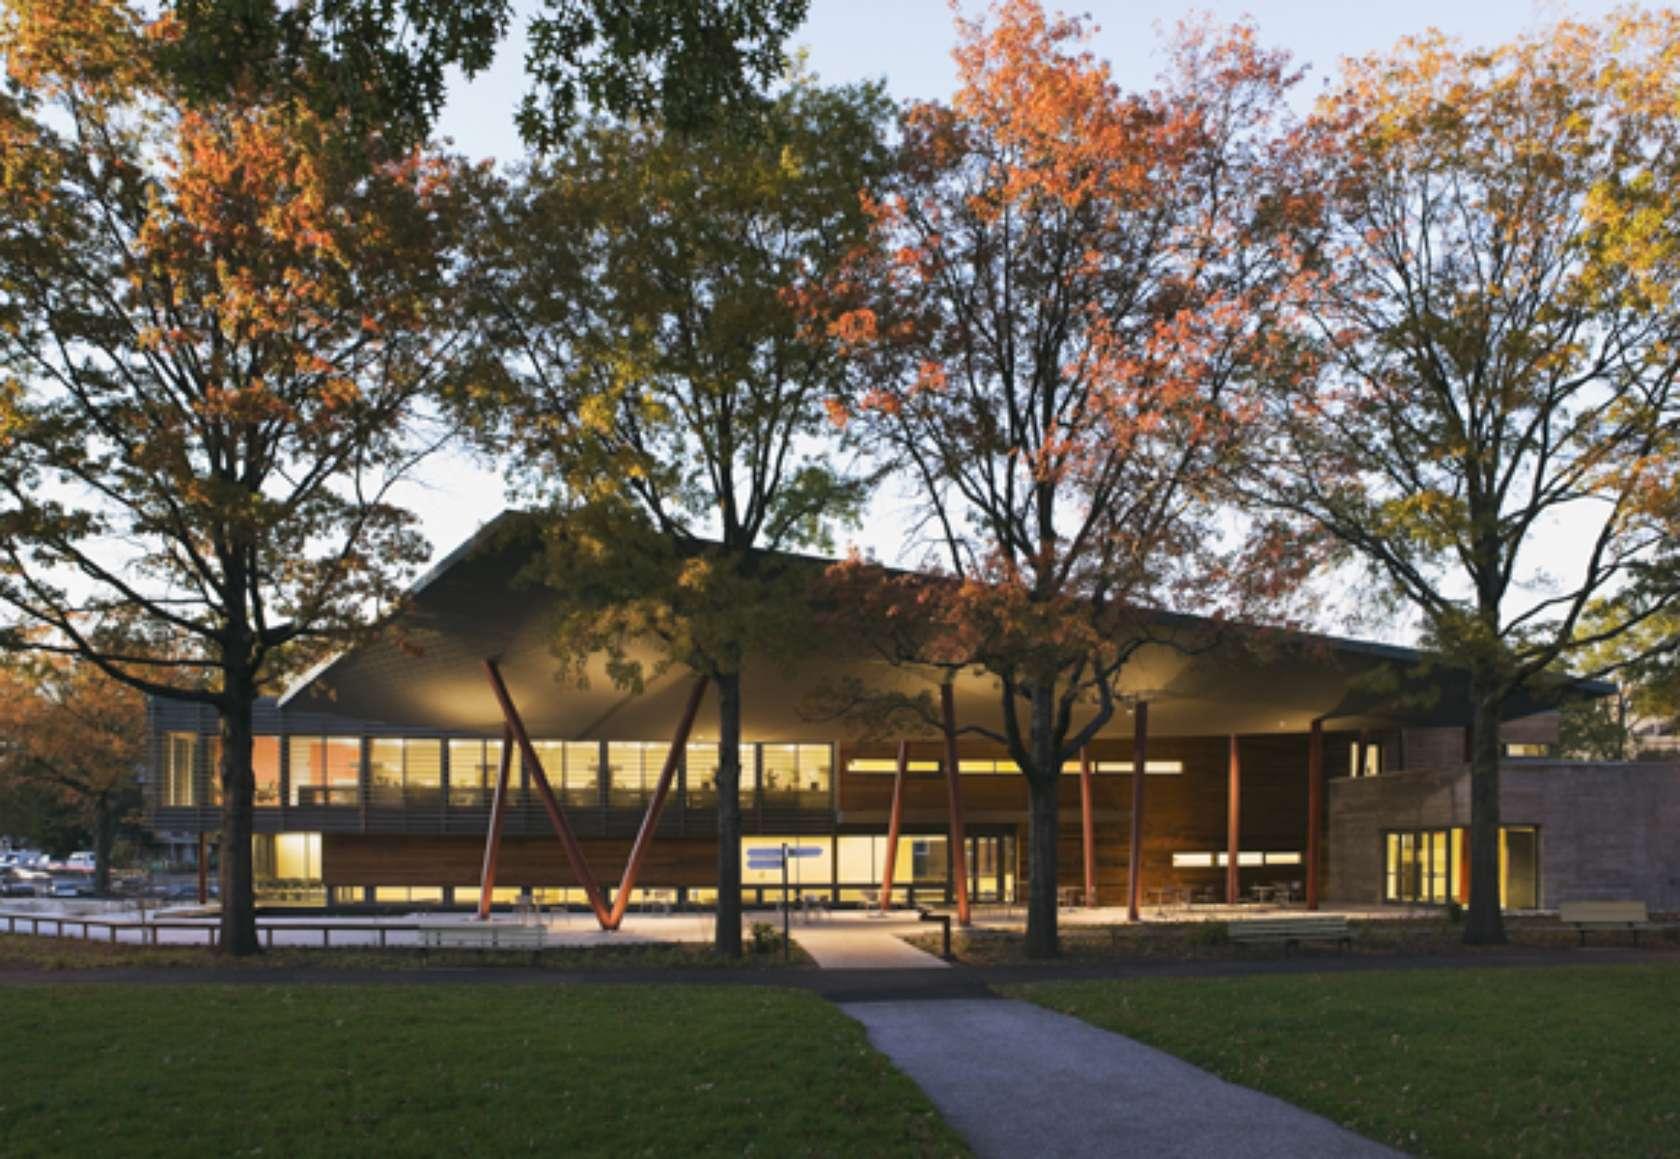 Queens Botanical Garden Visitor Administration Center